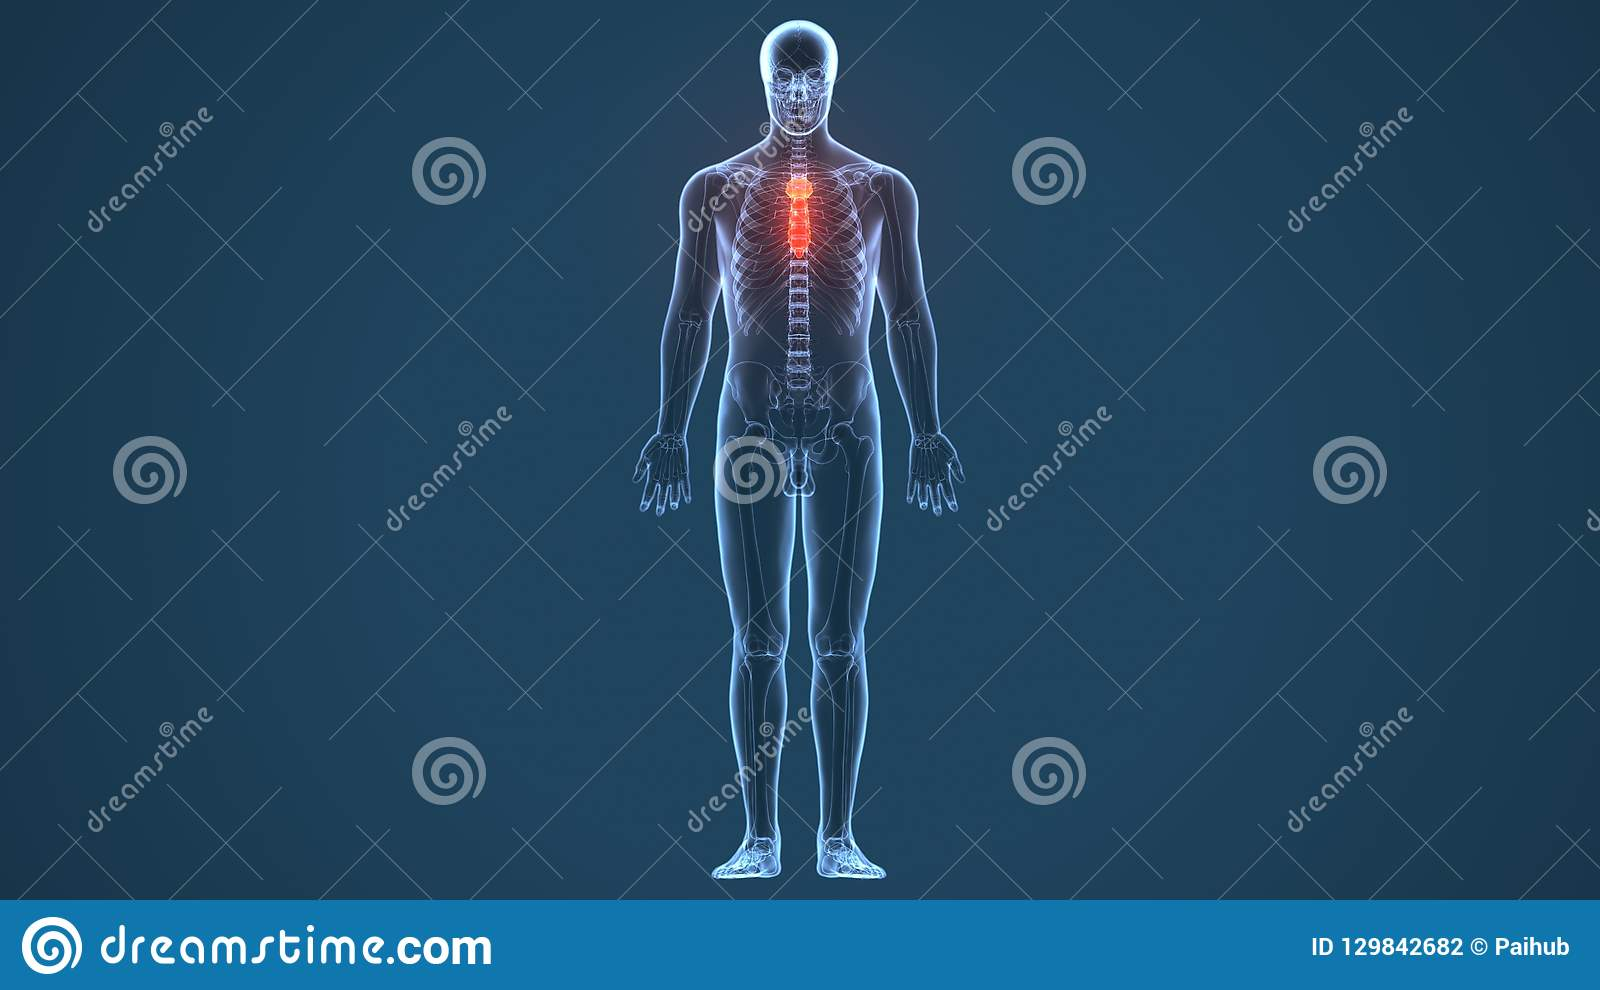 3d Illustration Of Sternum Part Of Human Skeleton Stock